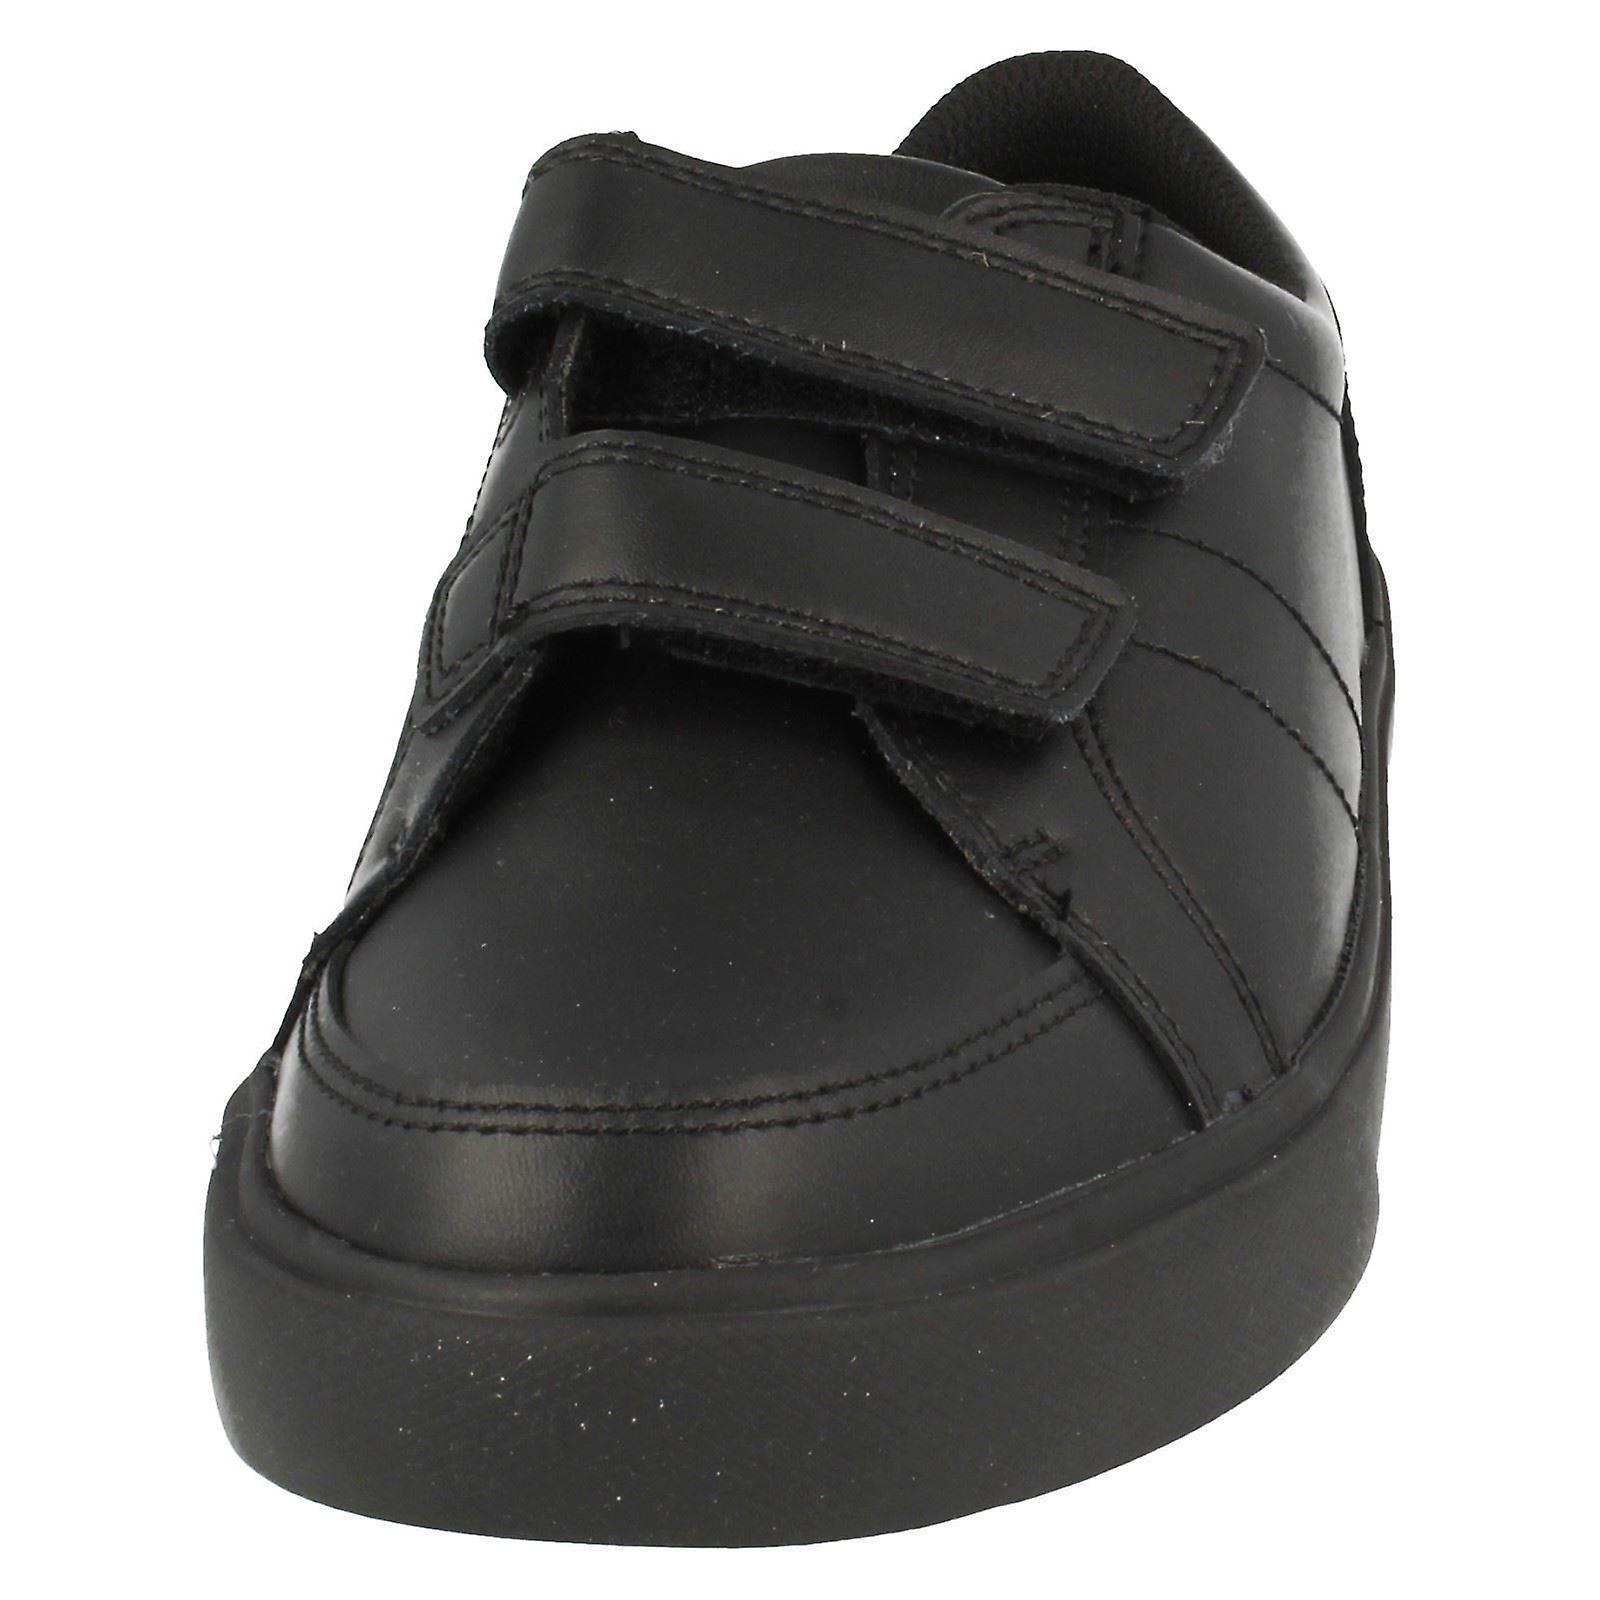 Senior Garçons Bootleg Par Clarks Shoes/école Formelle Kensal Race